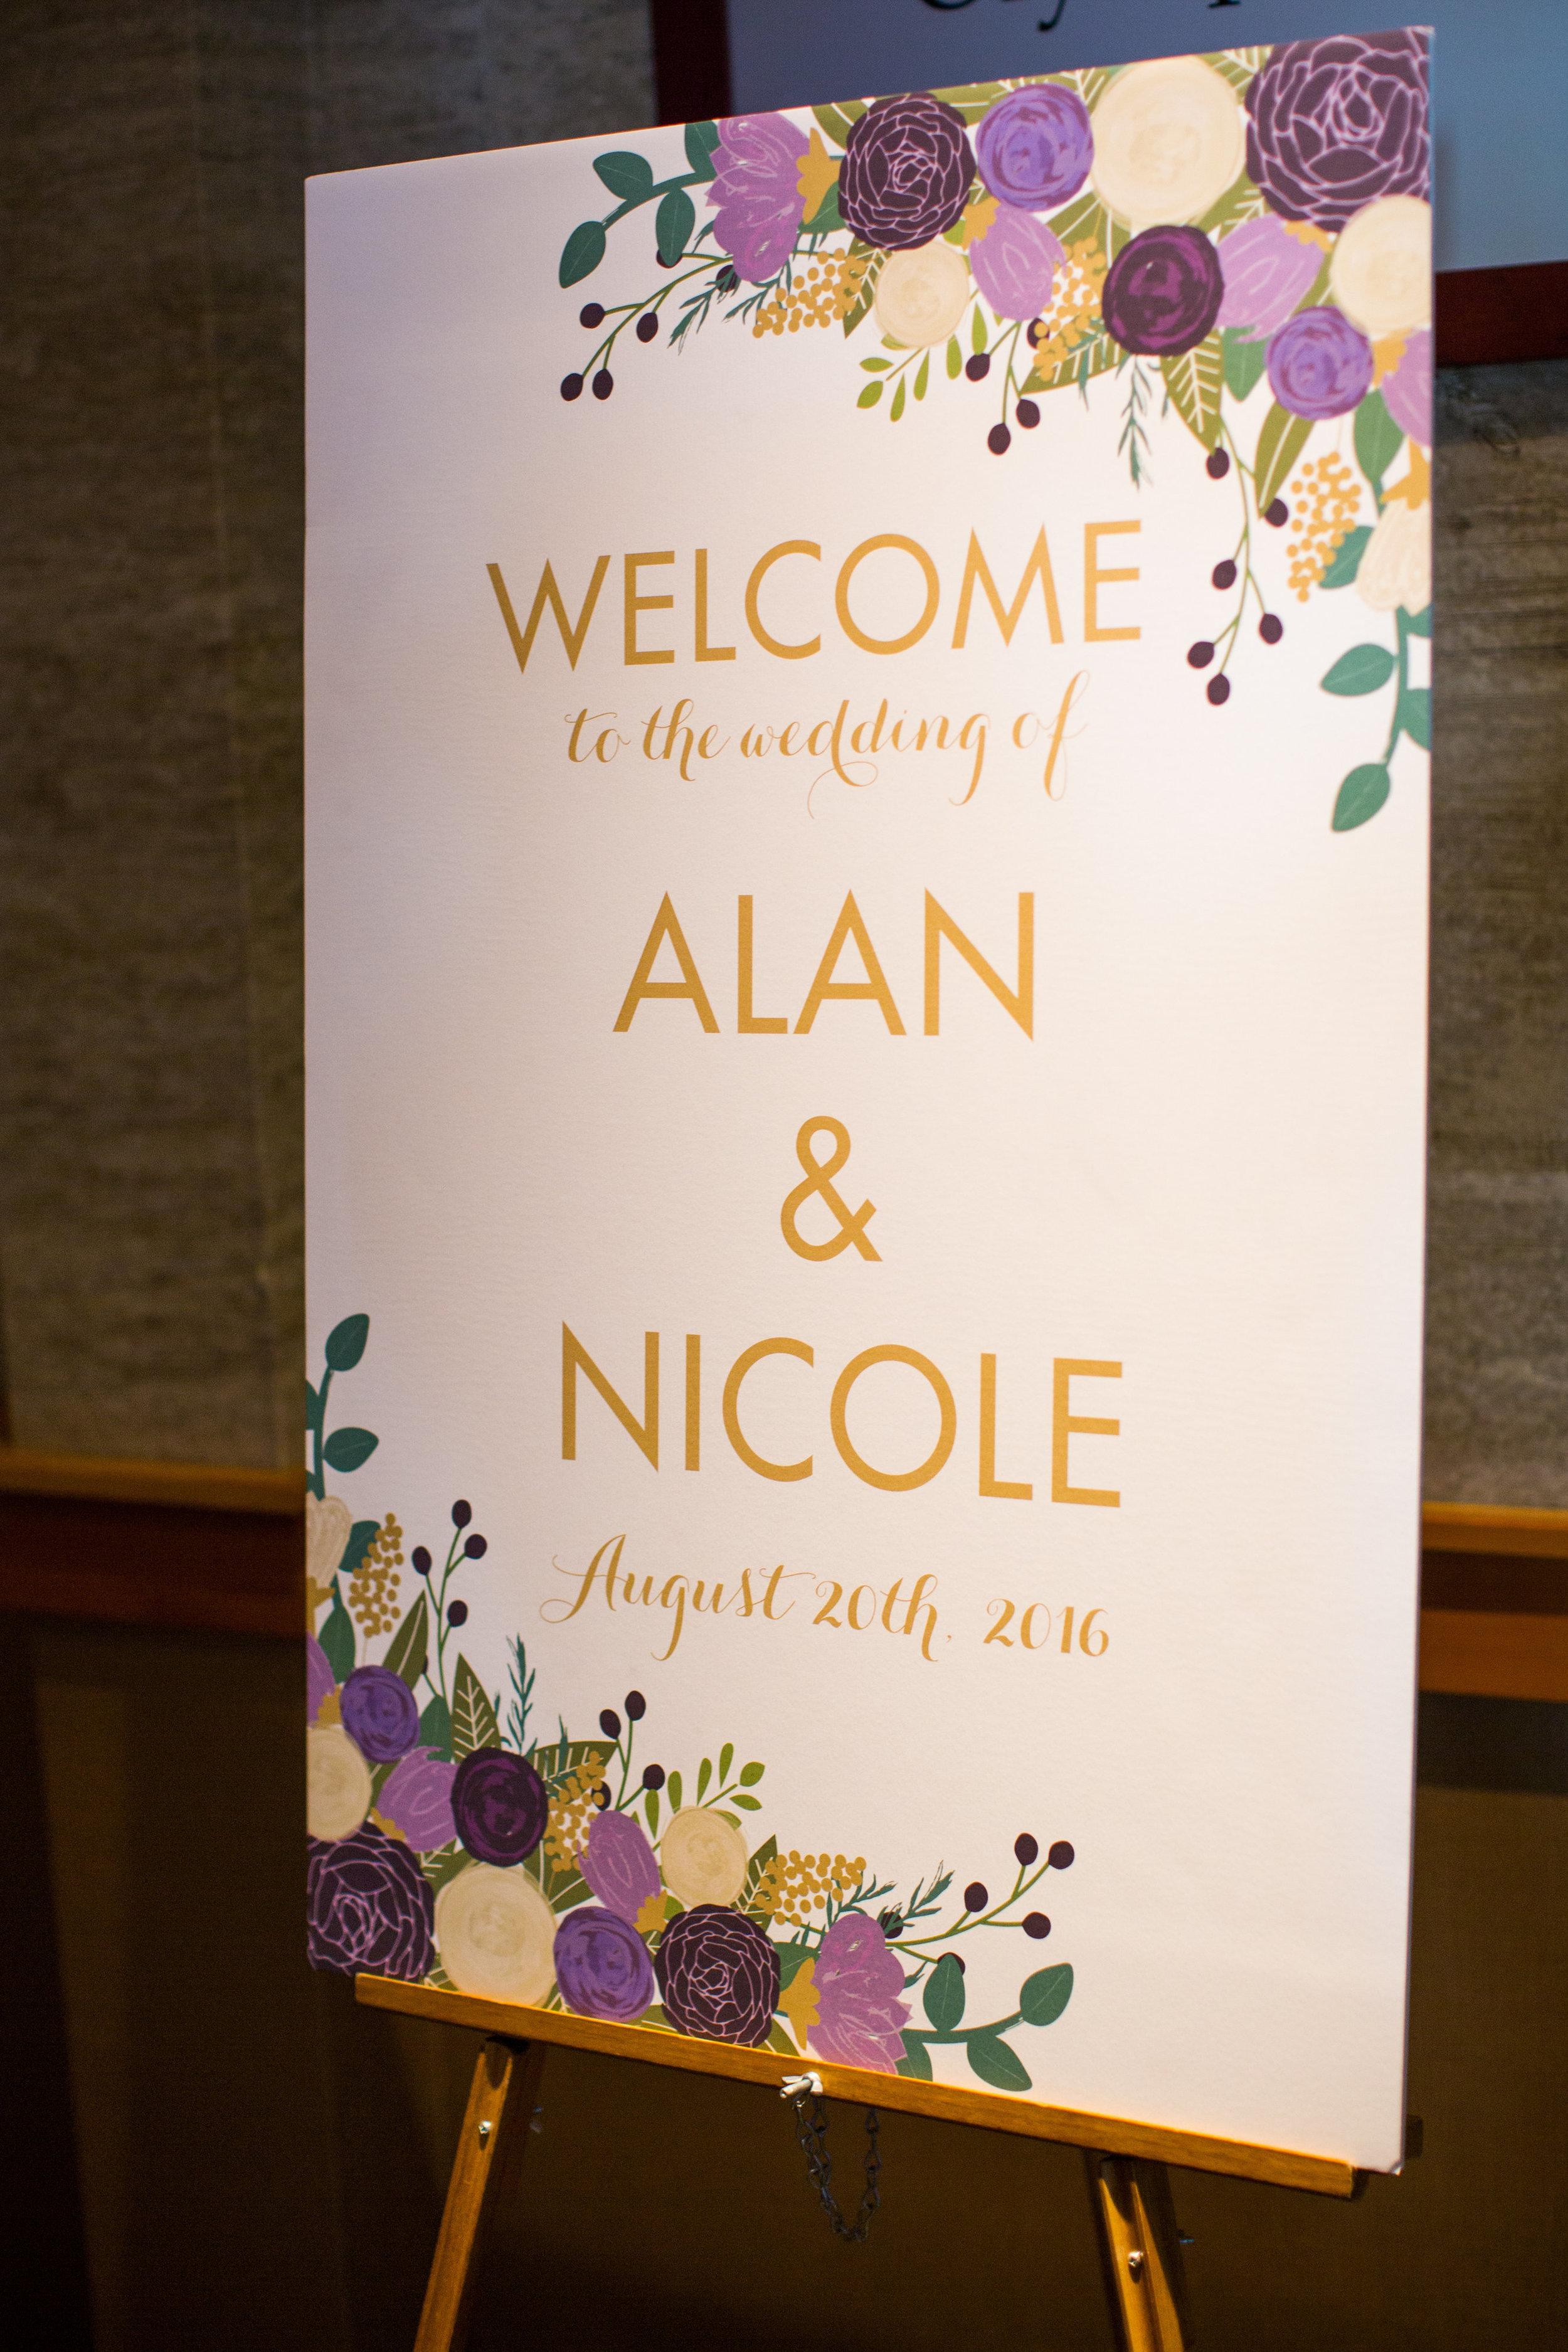 Seattle Wedding Planner, Wedding Wise | Ciccarelli Photography | Edgewater Hotel Wedding | Purple and navy blue wedding | Wedding welcome sign